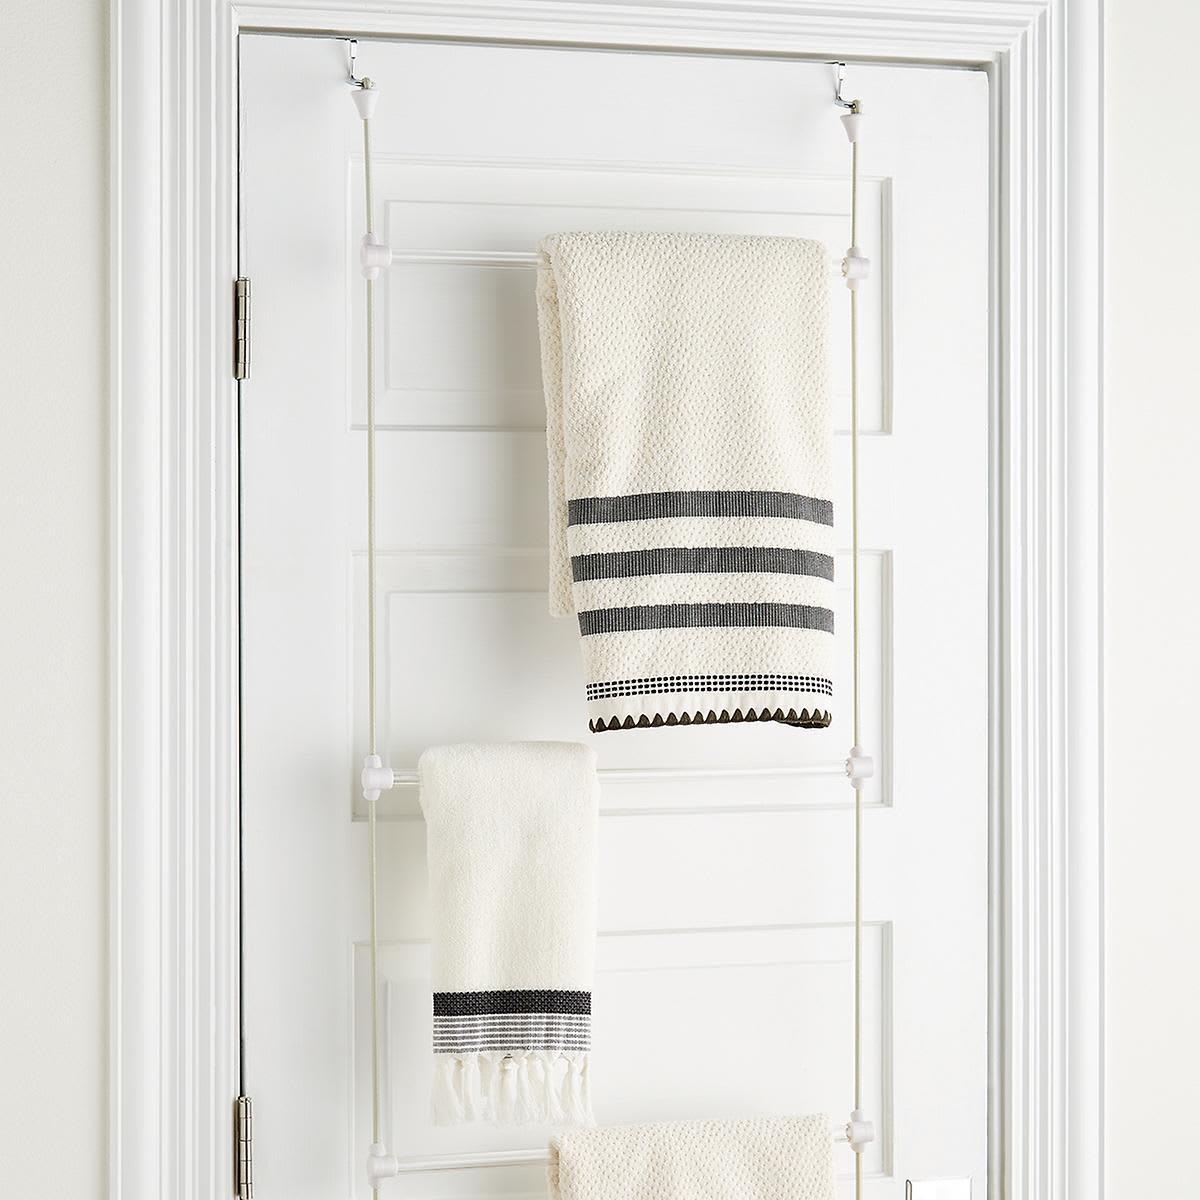 Bathroom Storage Ideas - Storage For Small Bathrooms ... on Small Apartment Bathroom Storage Ideas  id=63139